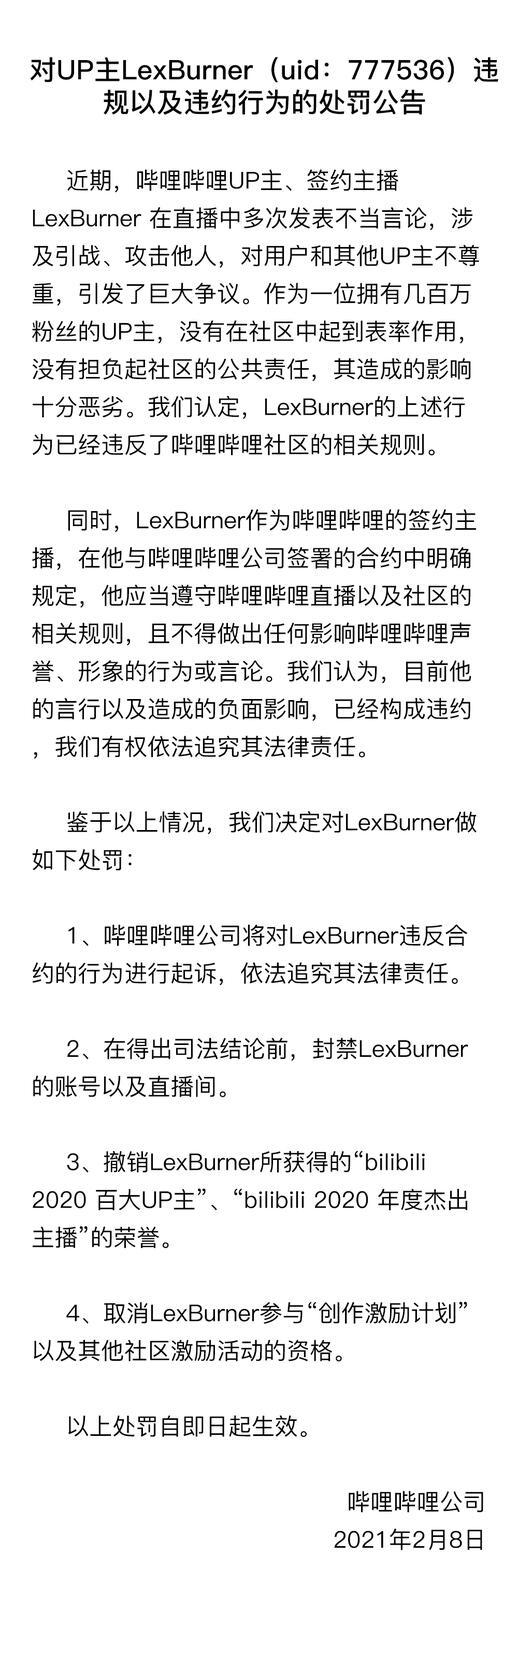 B站处罚百万粉丝UP主LexBurner:封禁账号 起诉追究责任